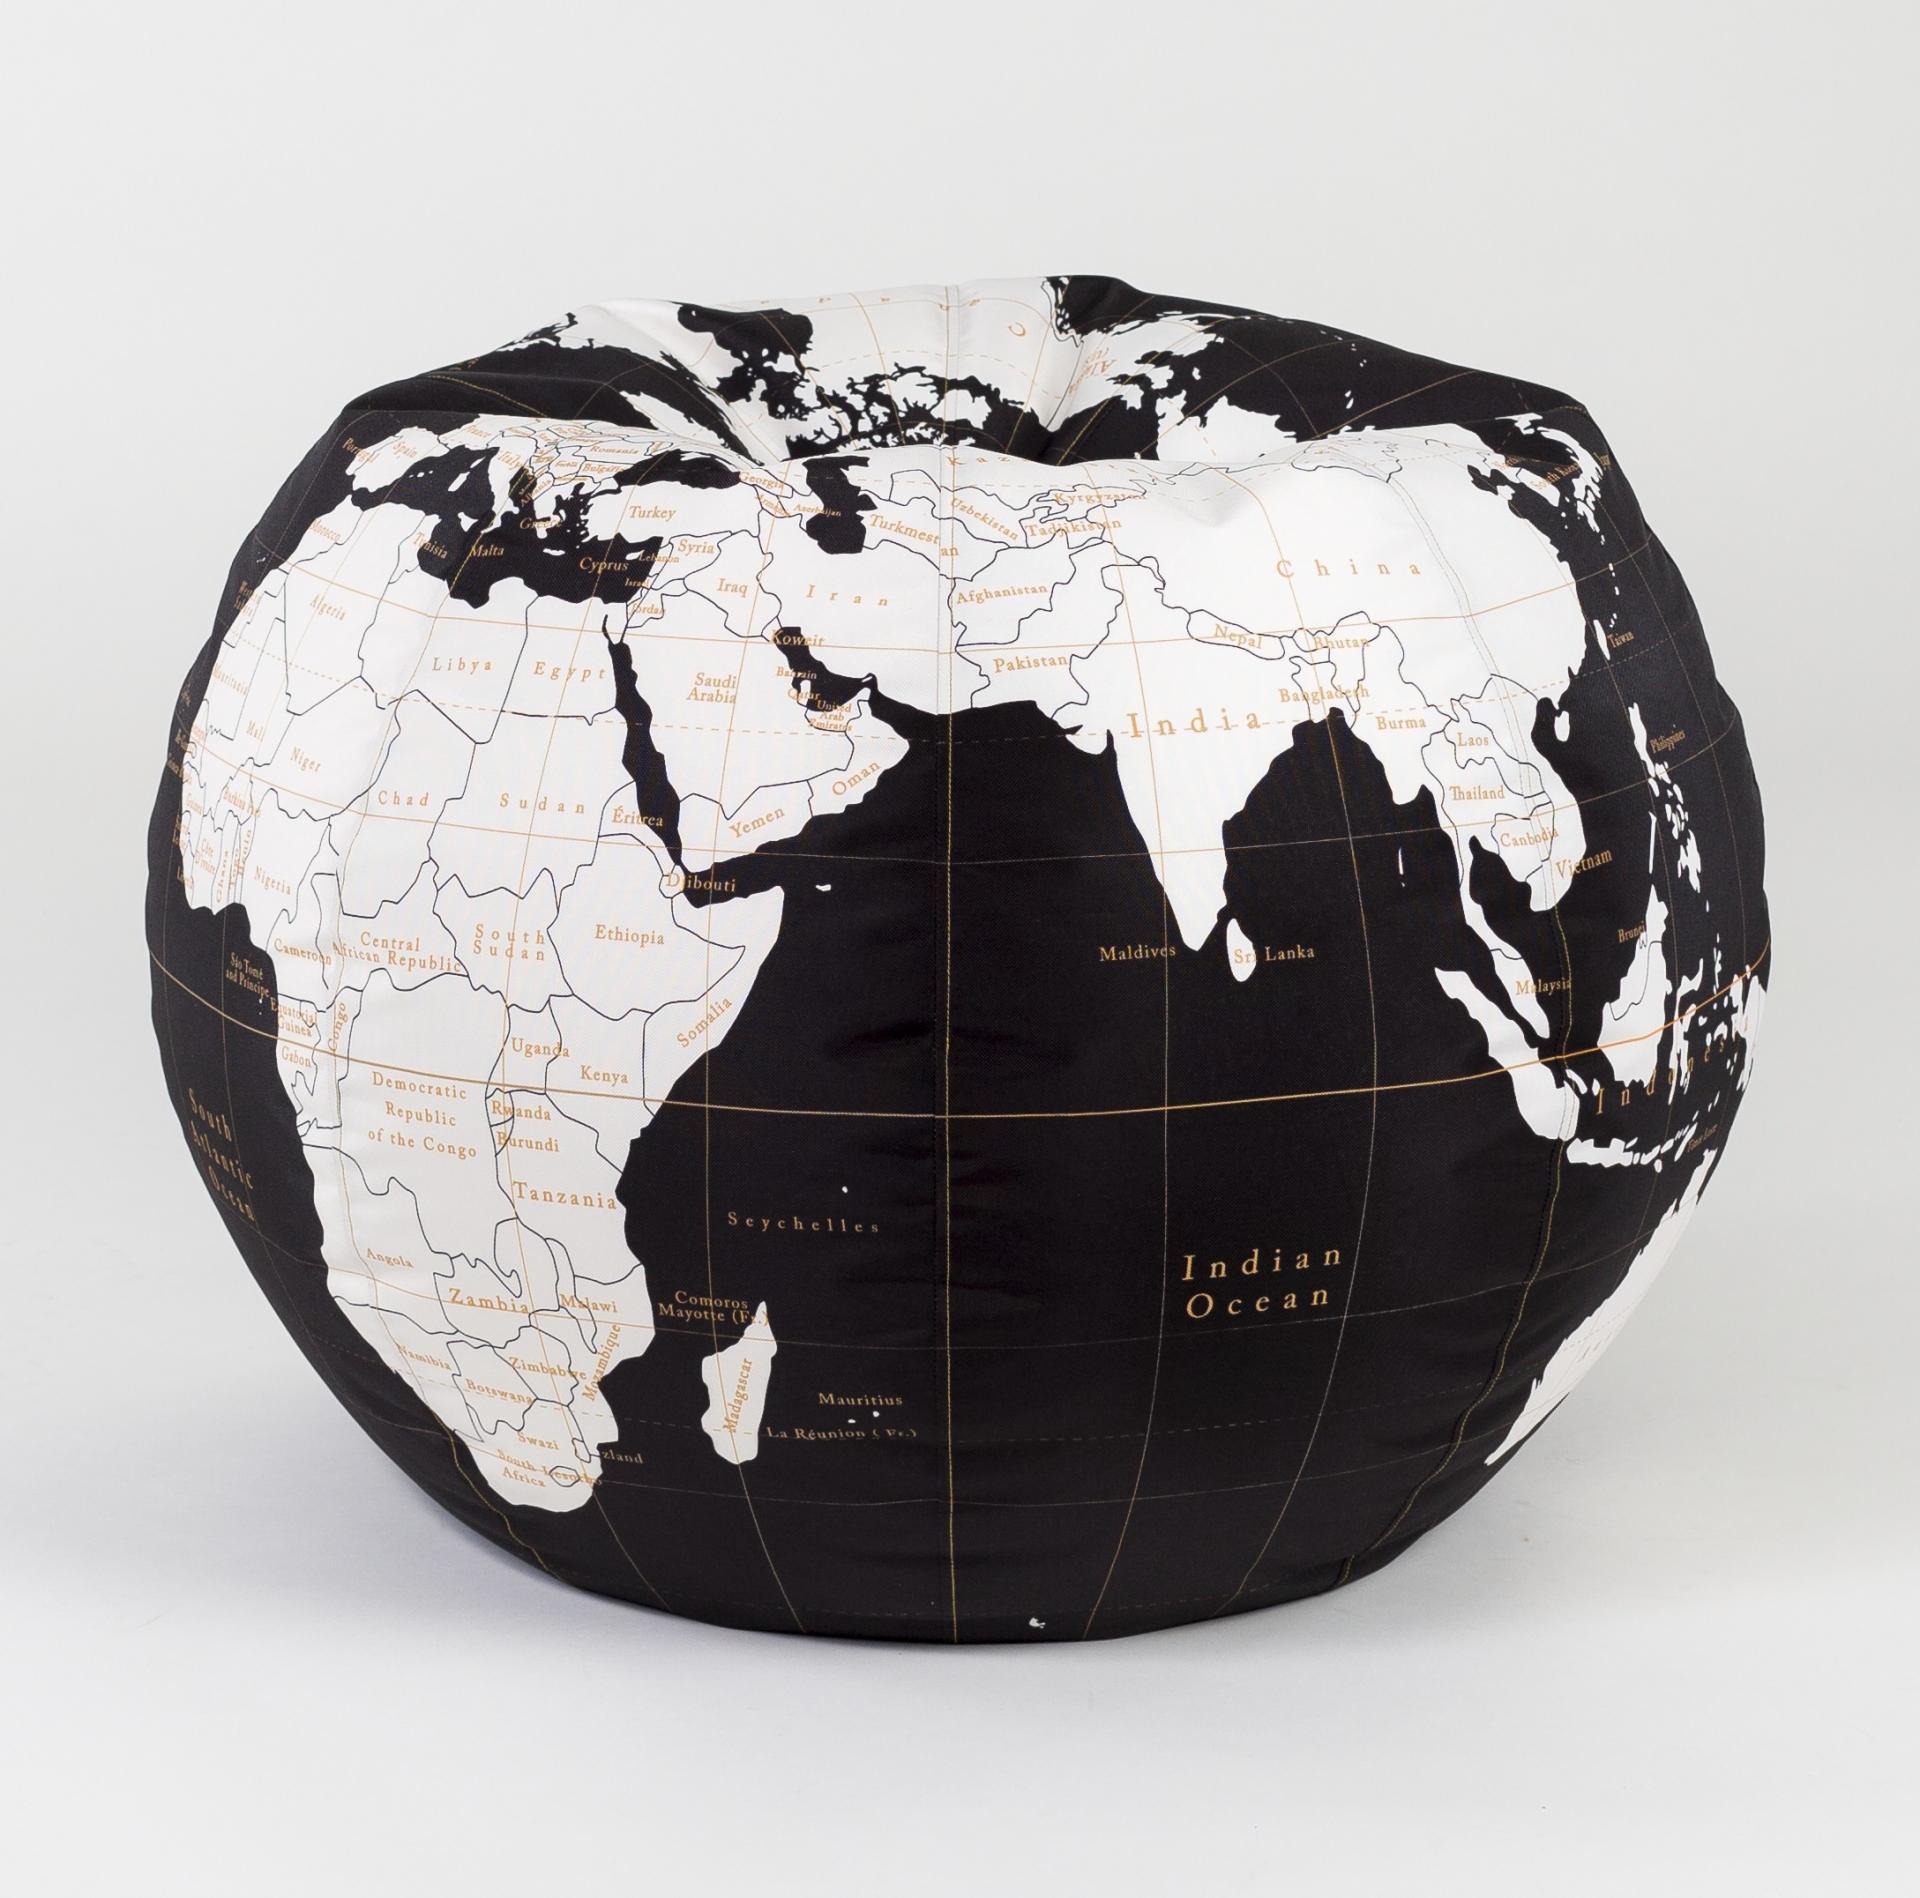 Woouf! Sedací vak Small Globe, černá barva, krémová barva, plast, textil